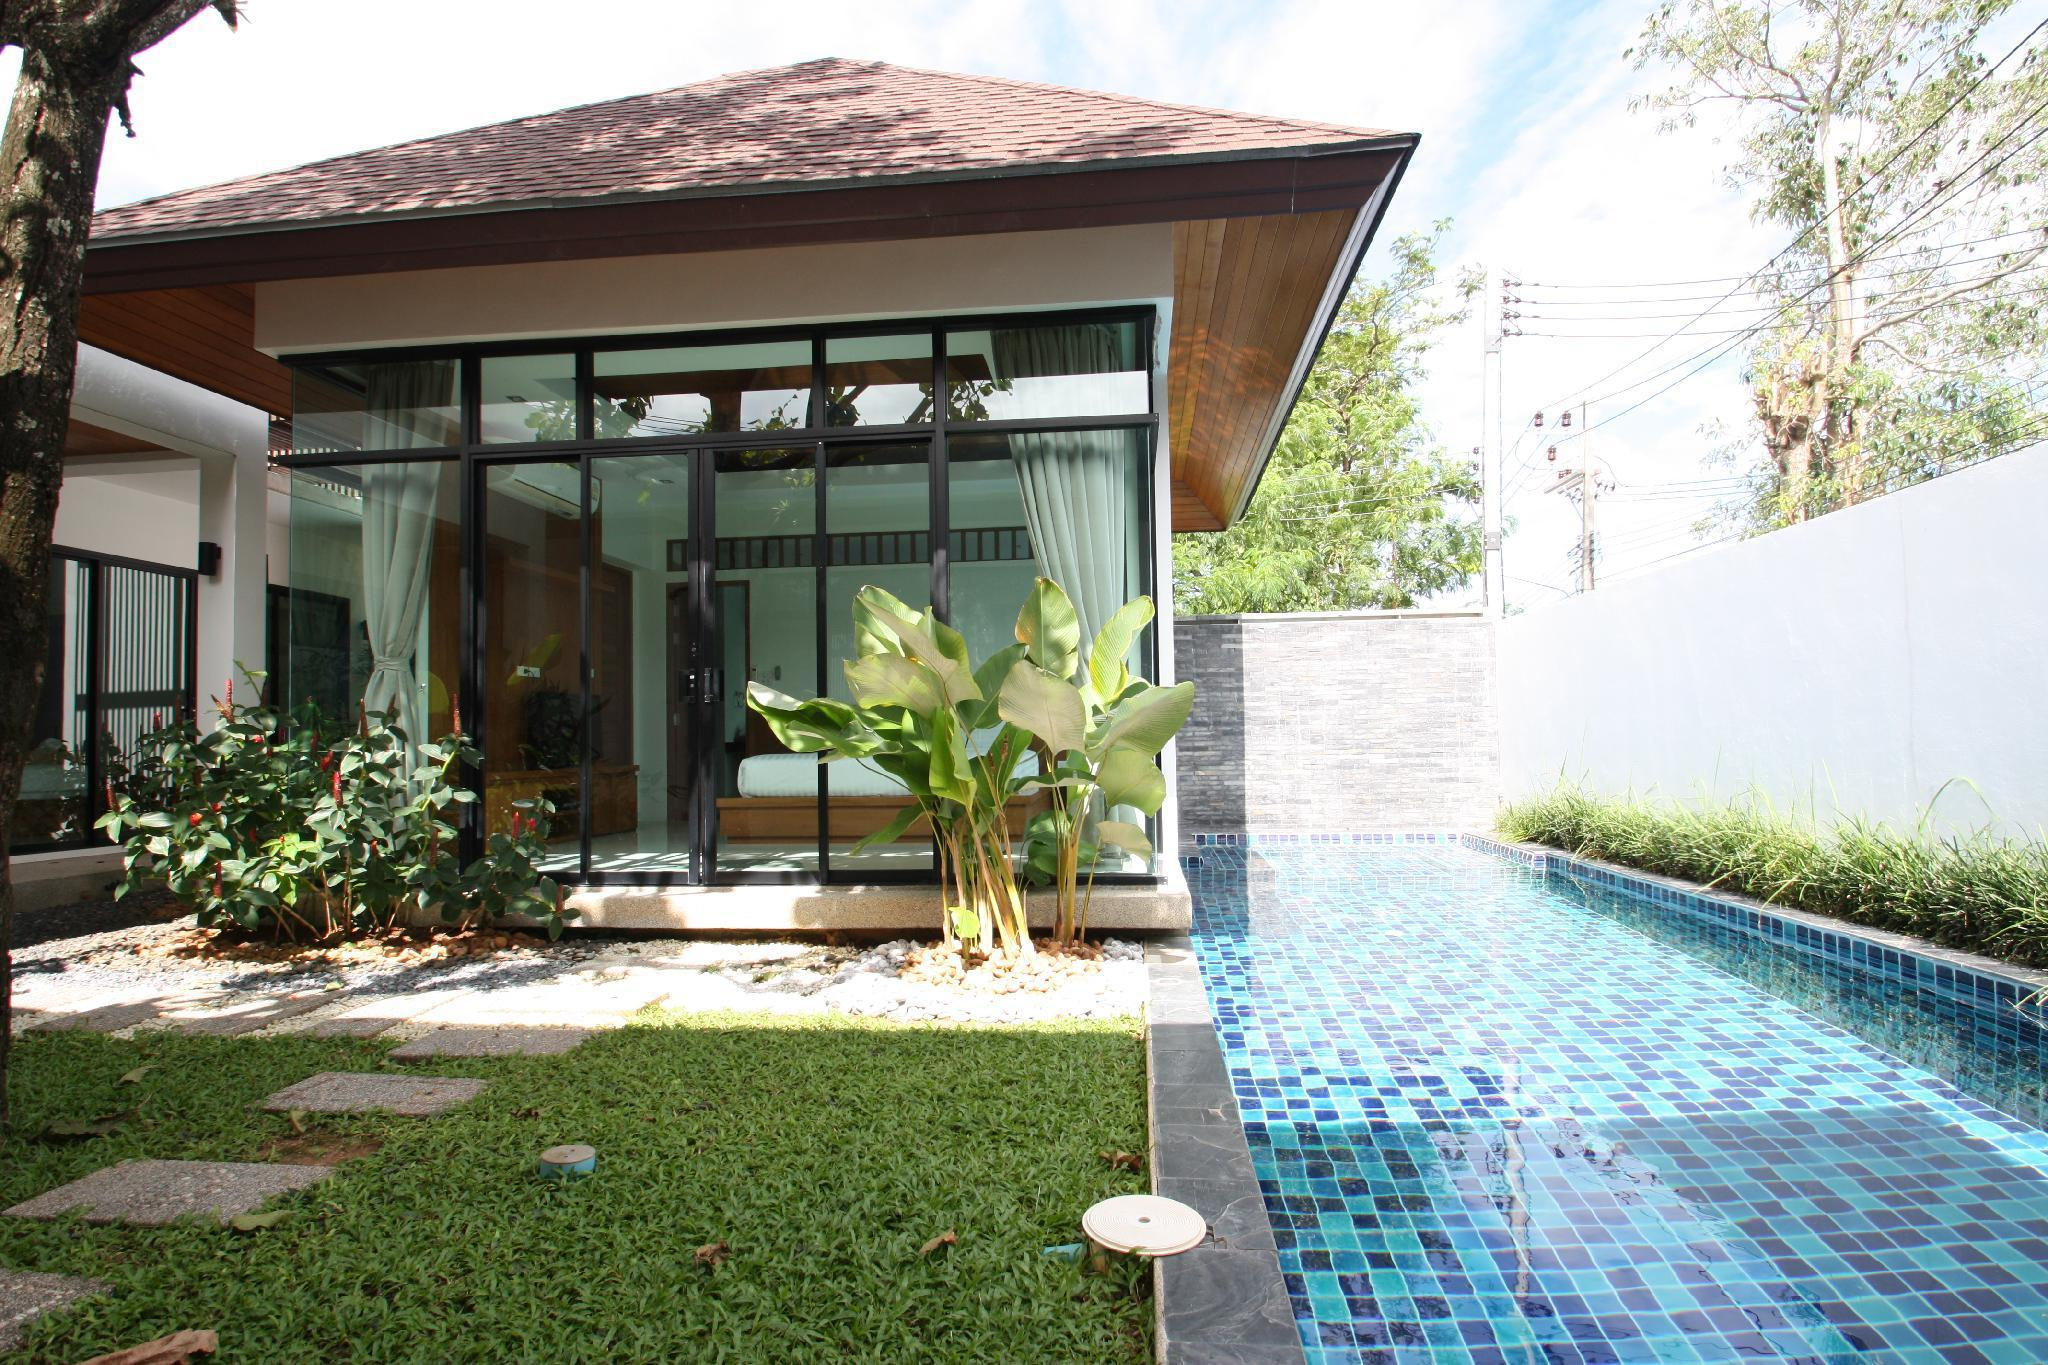 Cube1 Villa - Massayid Rd. Rawai, AKA Muay Thai Cube1 Villa - Massayid Rd. Rawai, AKA Muay Thai